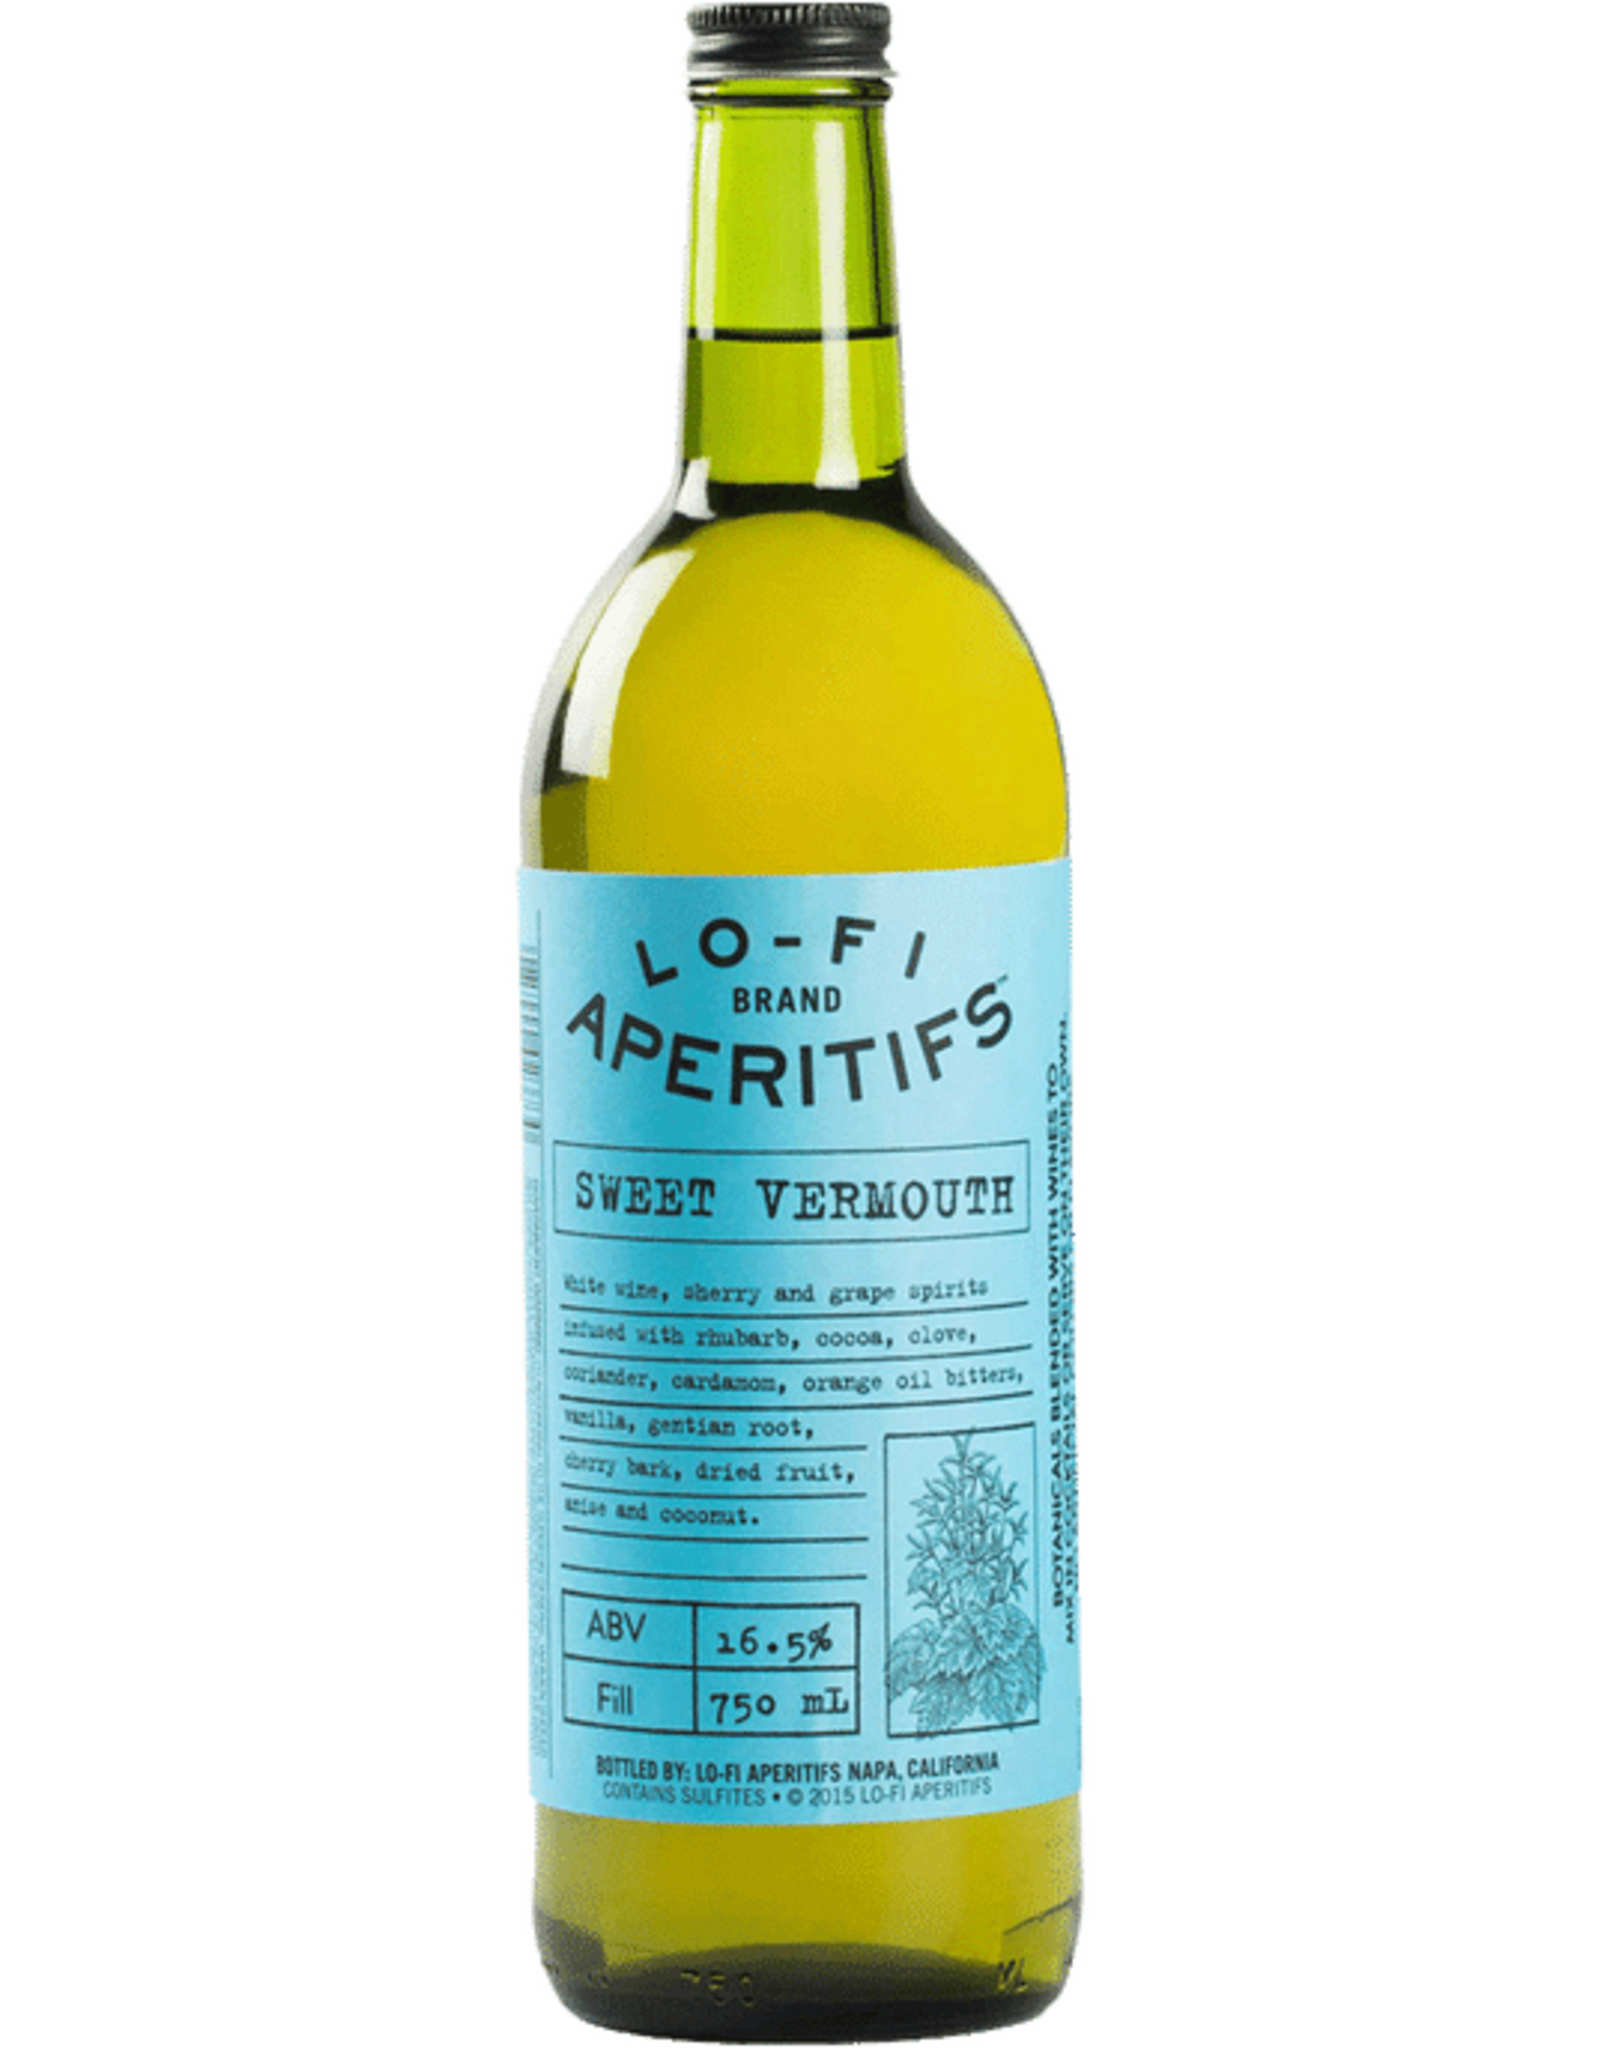 Lo-Fi Sweet Vermouth